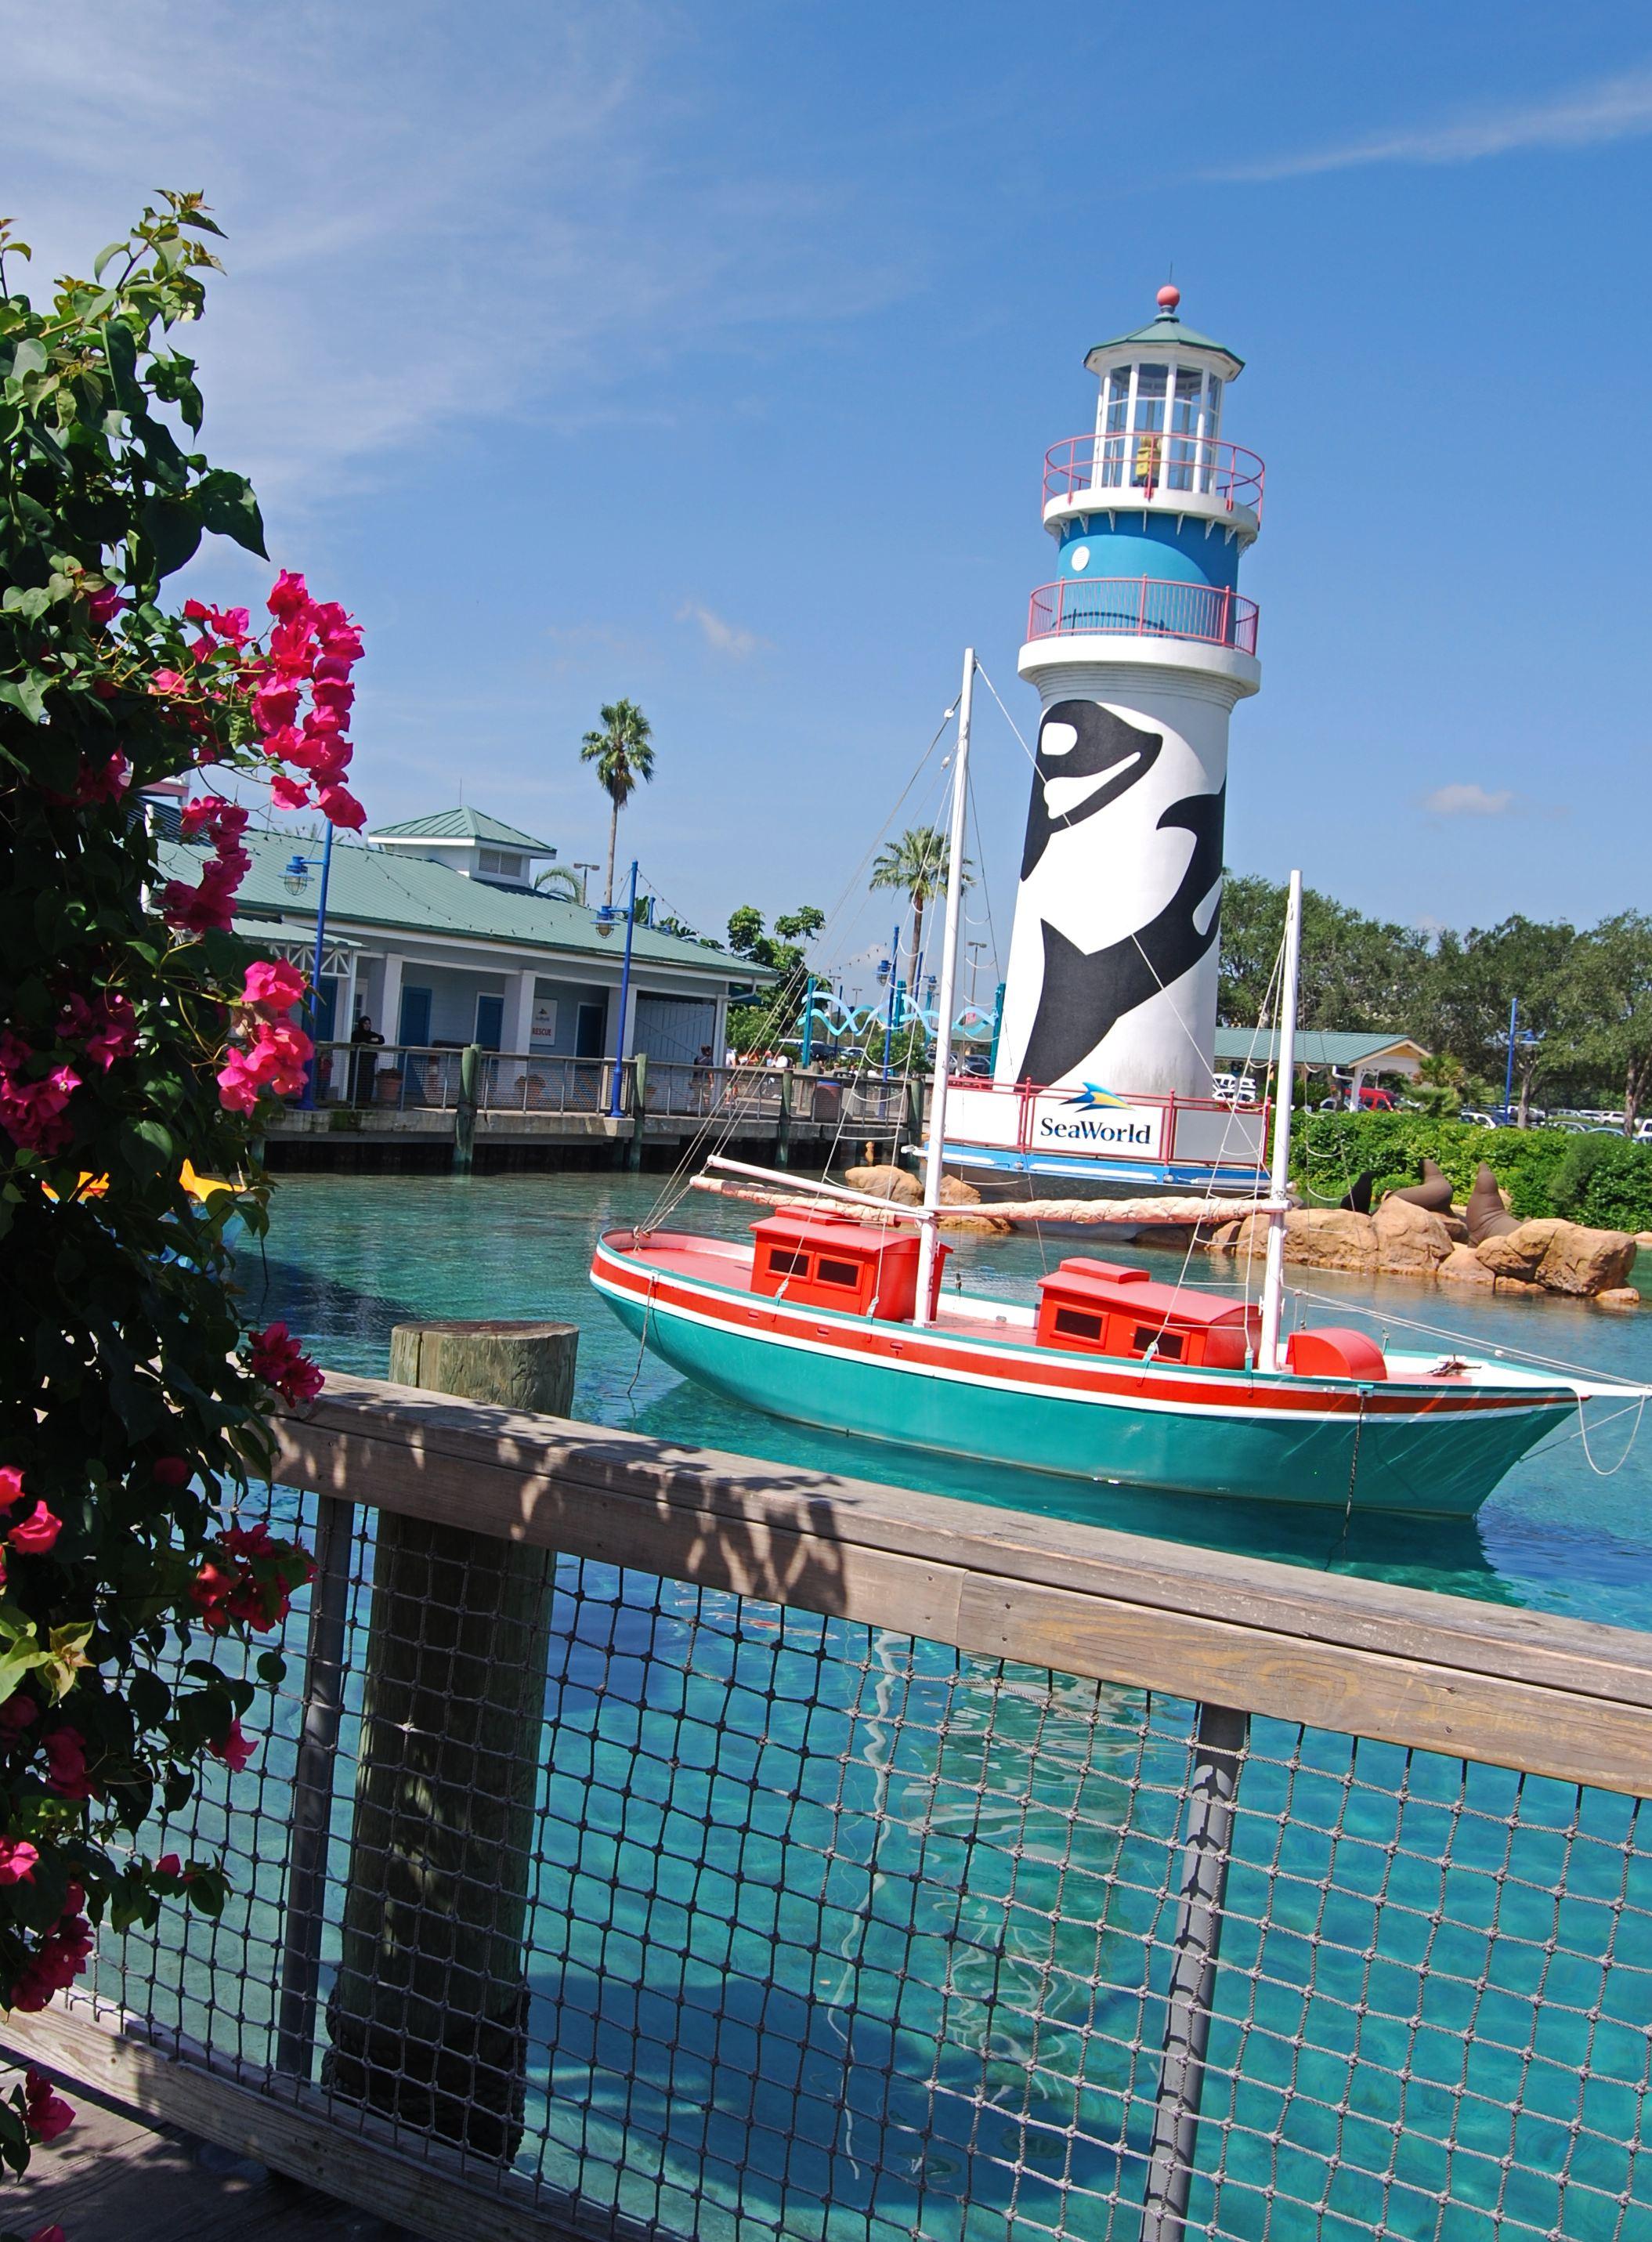 sea world light house - Dog friendly Kissimmee Florida